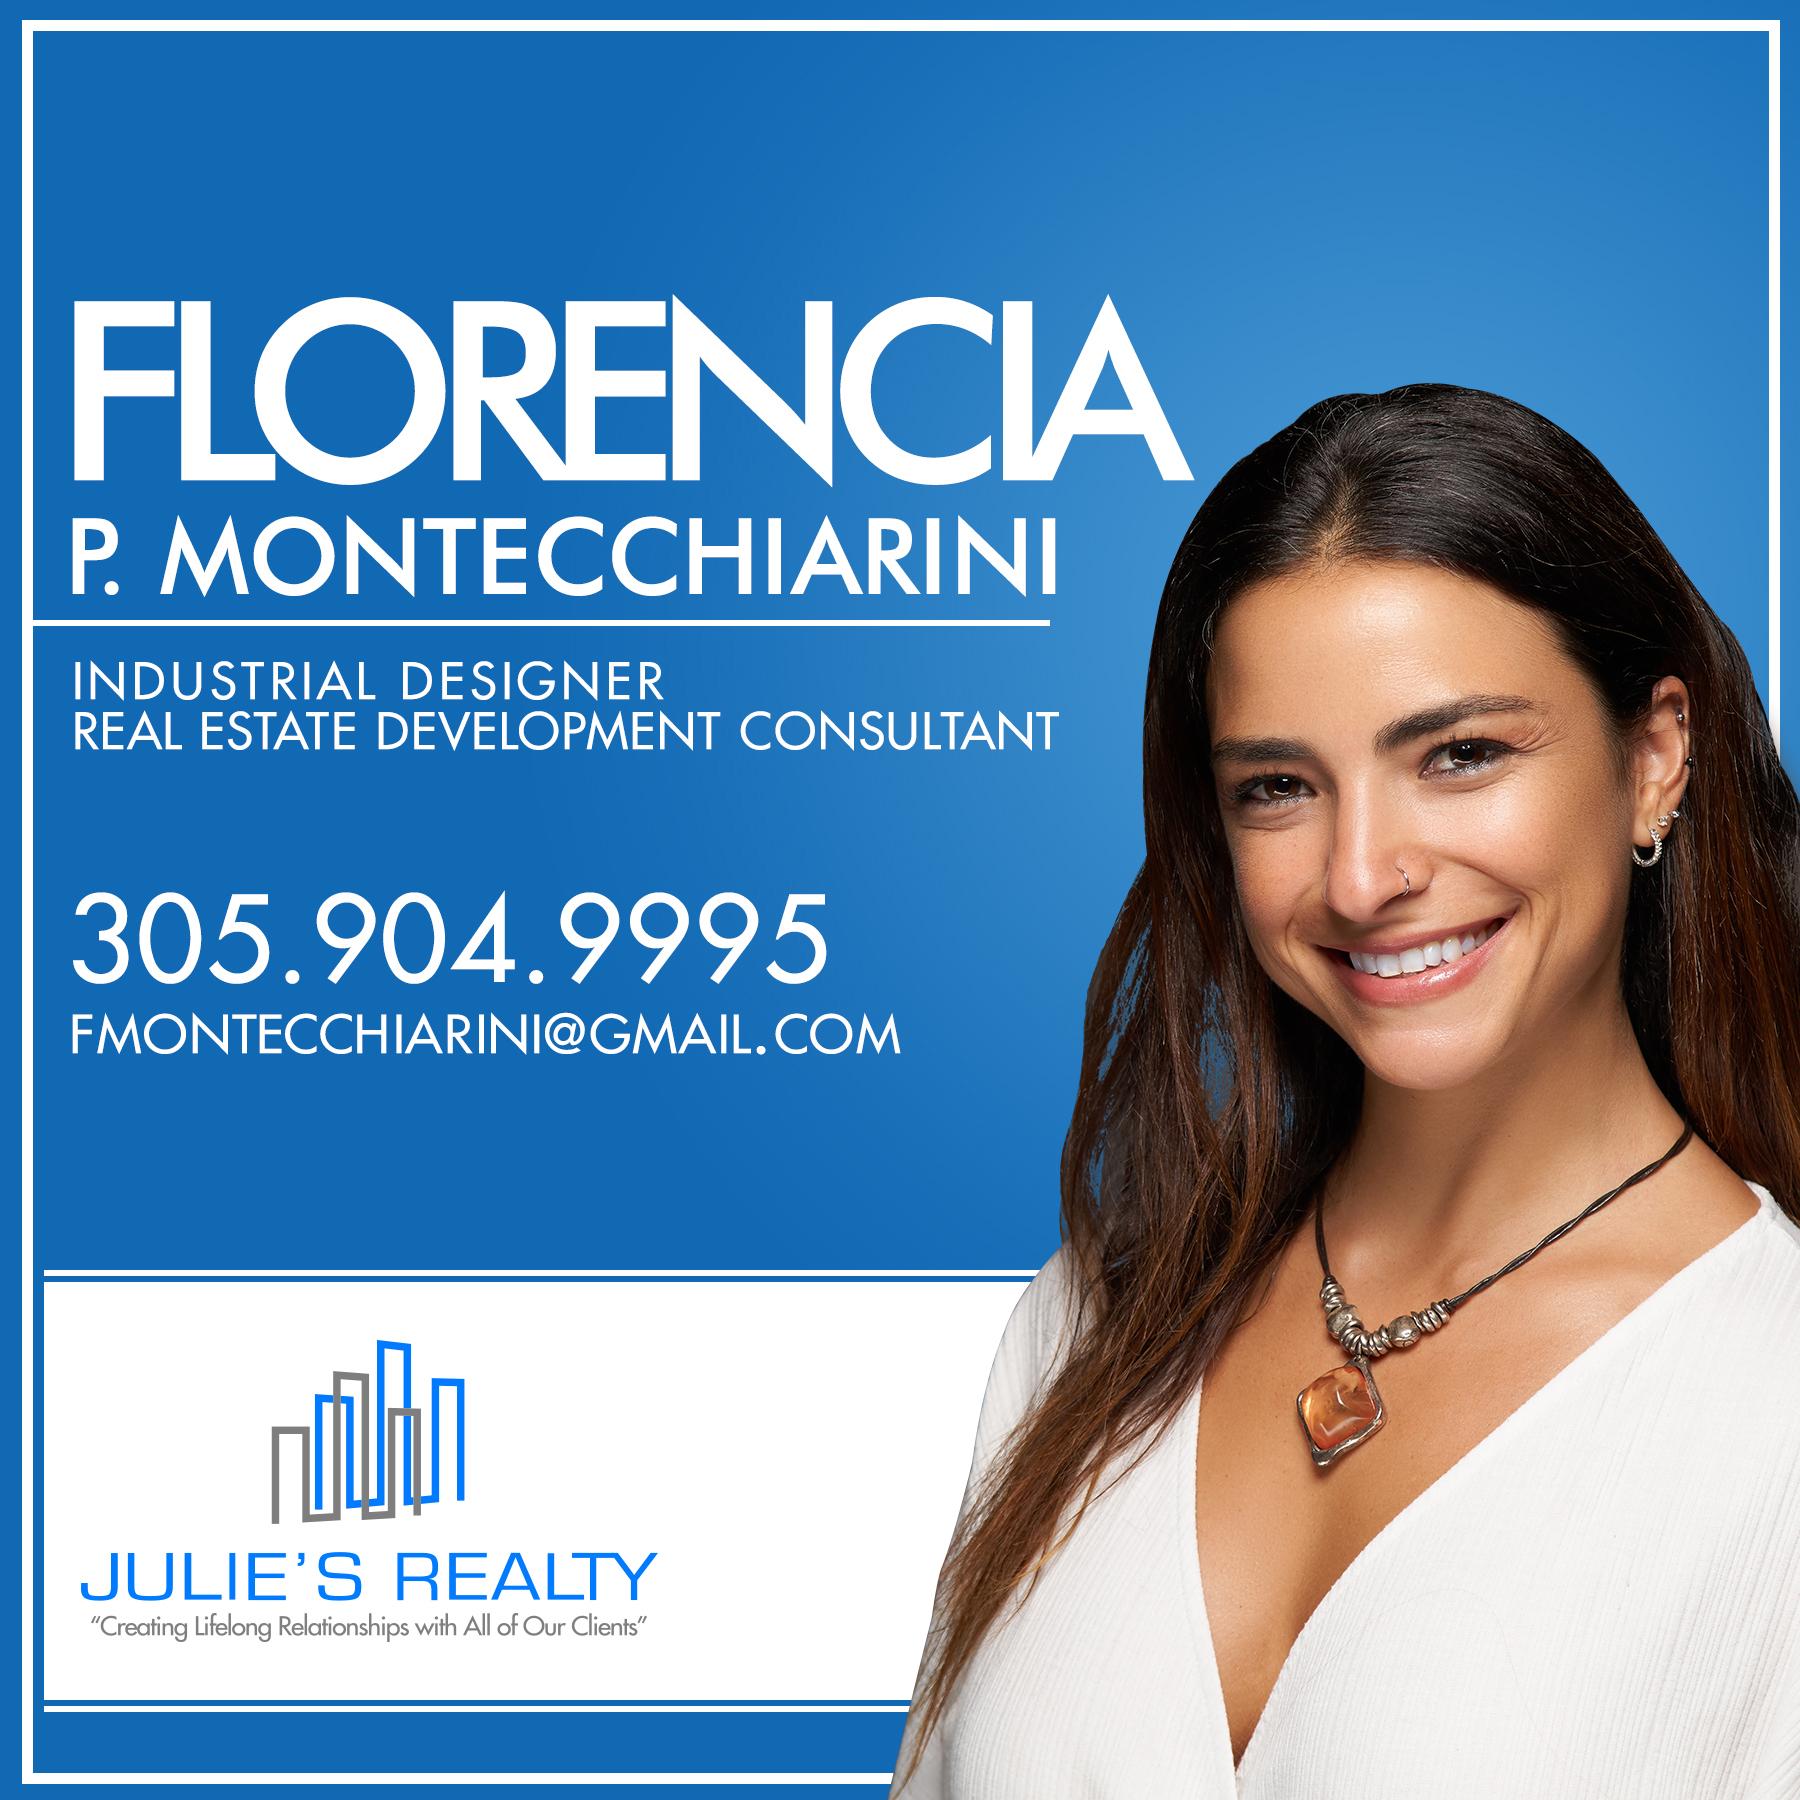 Florencia - Tile.jpg